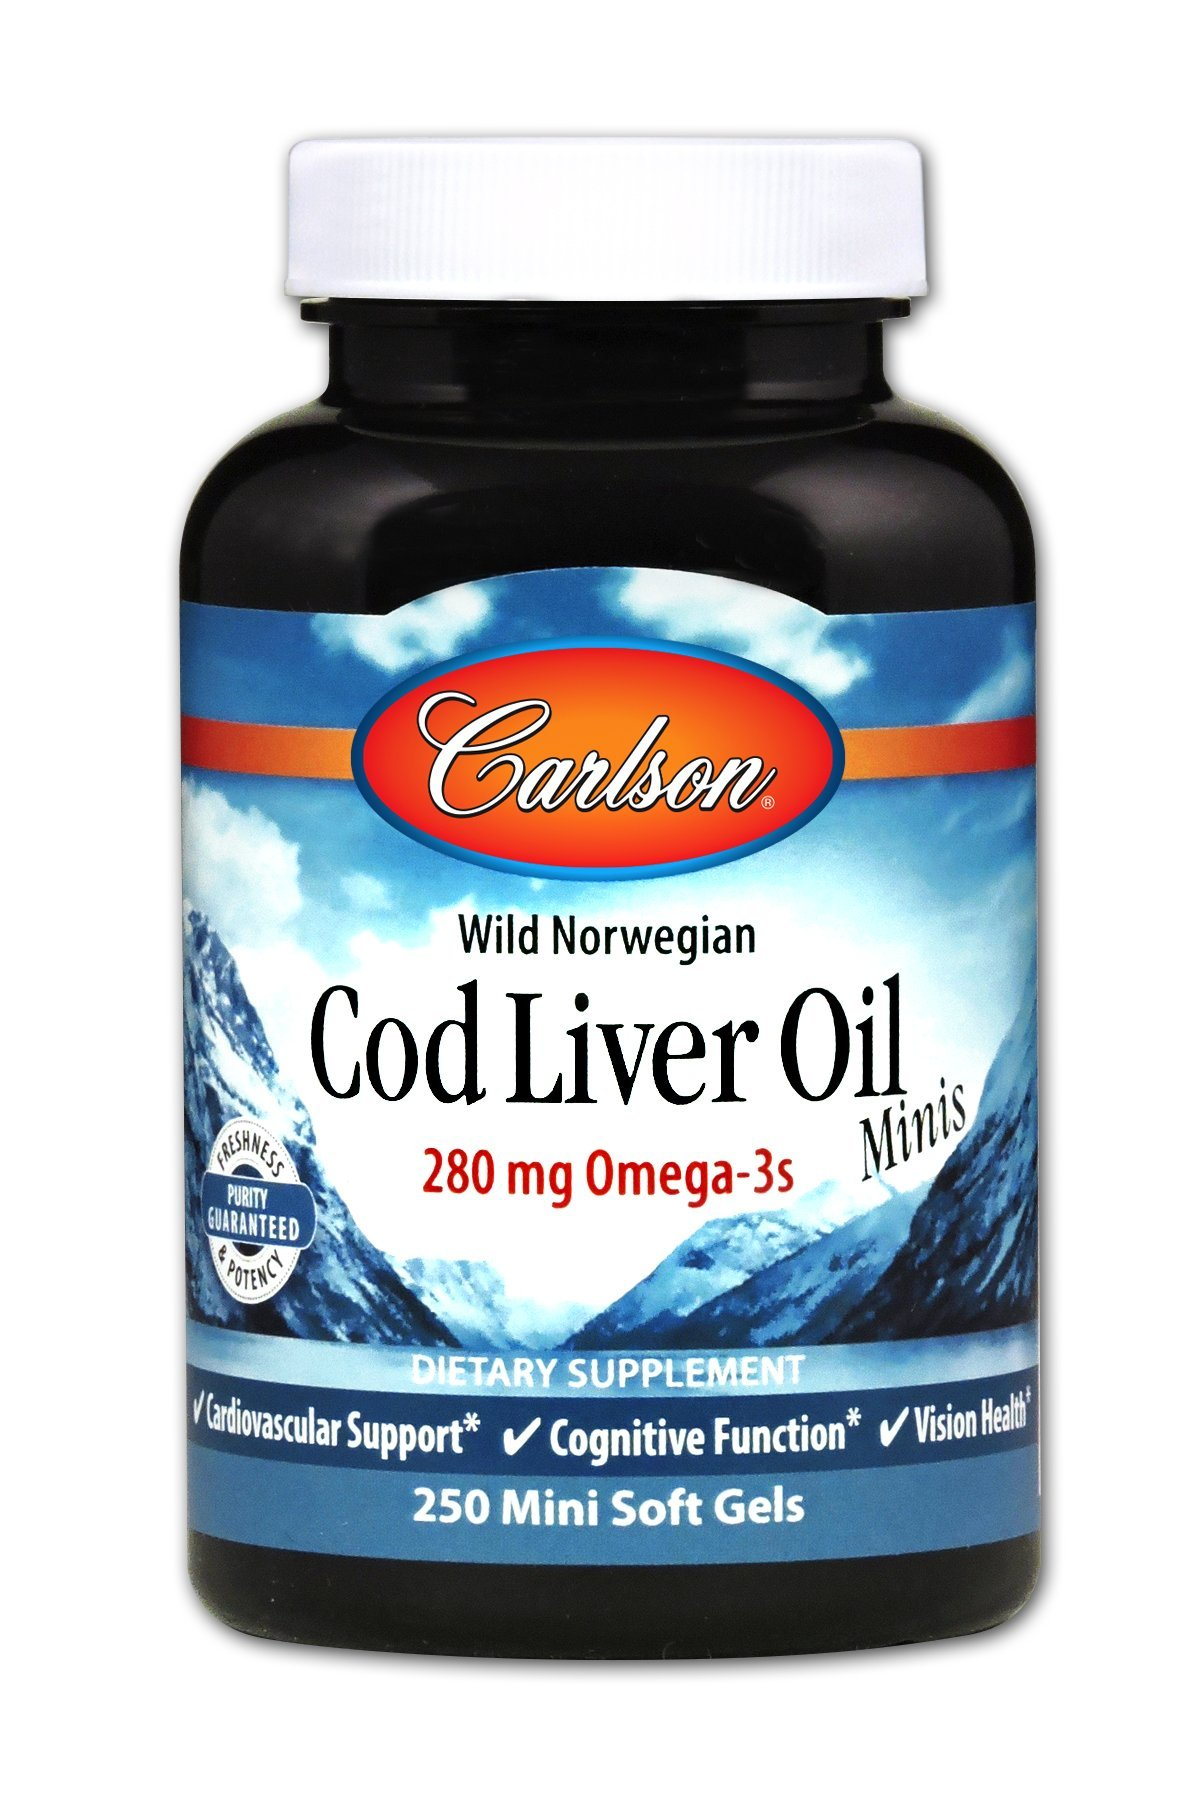 Carlson Norwegian Cod Liver Oil, 280 mg Omega-3s, 250 Soft Gels